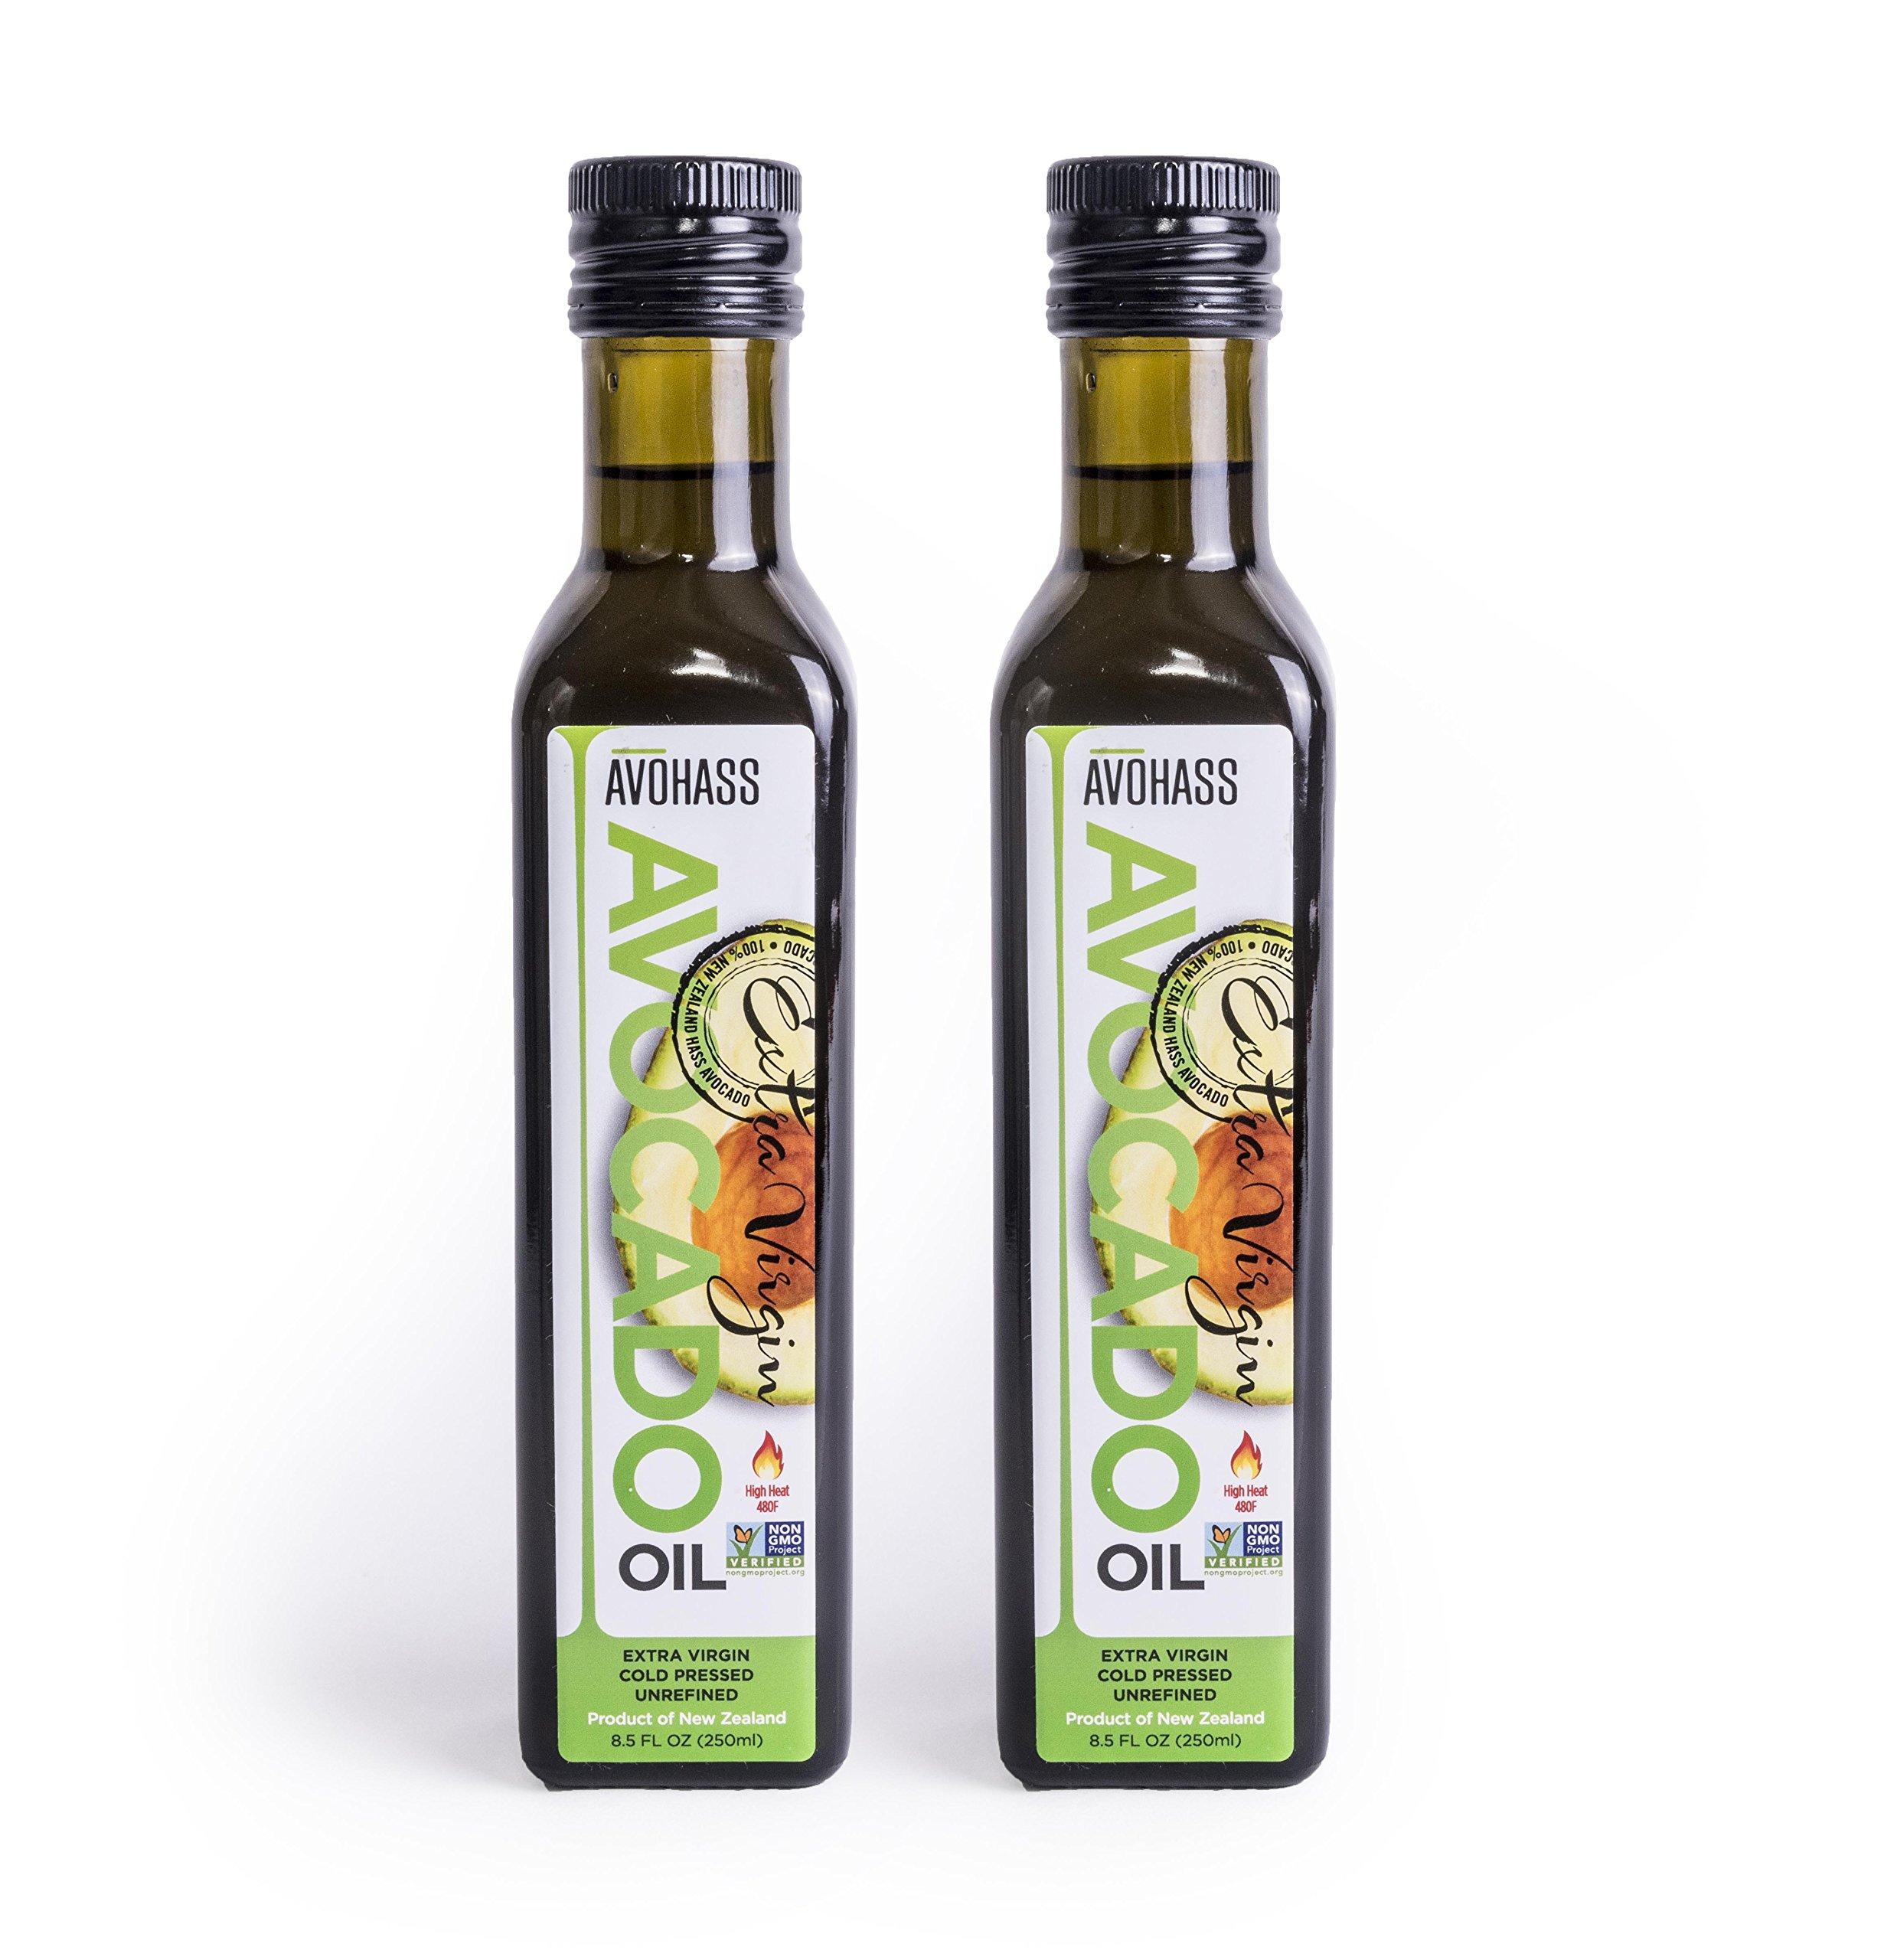 Avohass New Zealand Extra Virgin Avocado Oil 2 Bottle Case